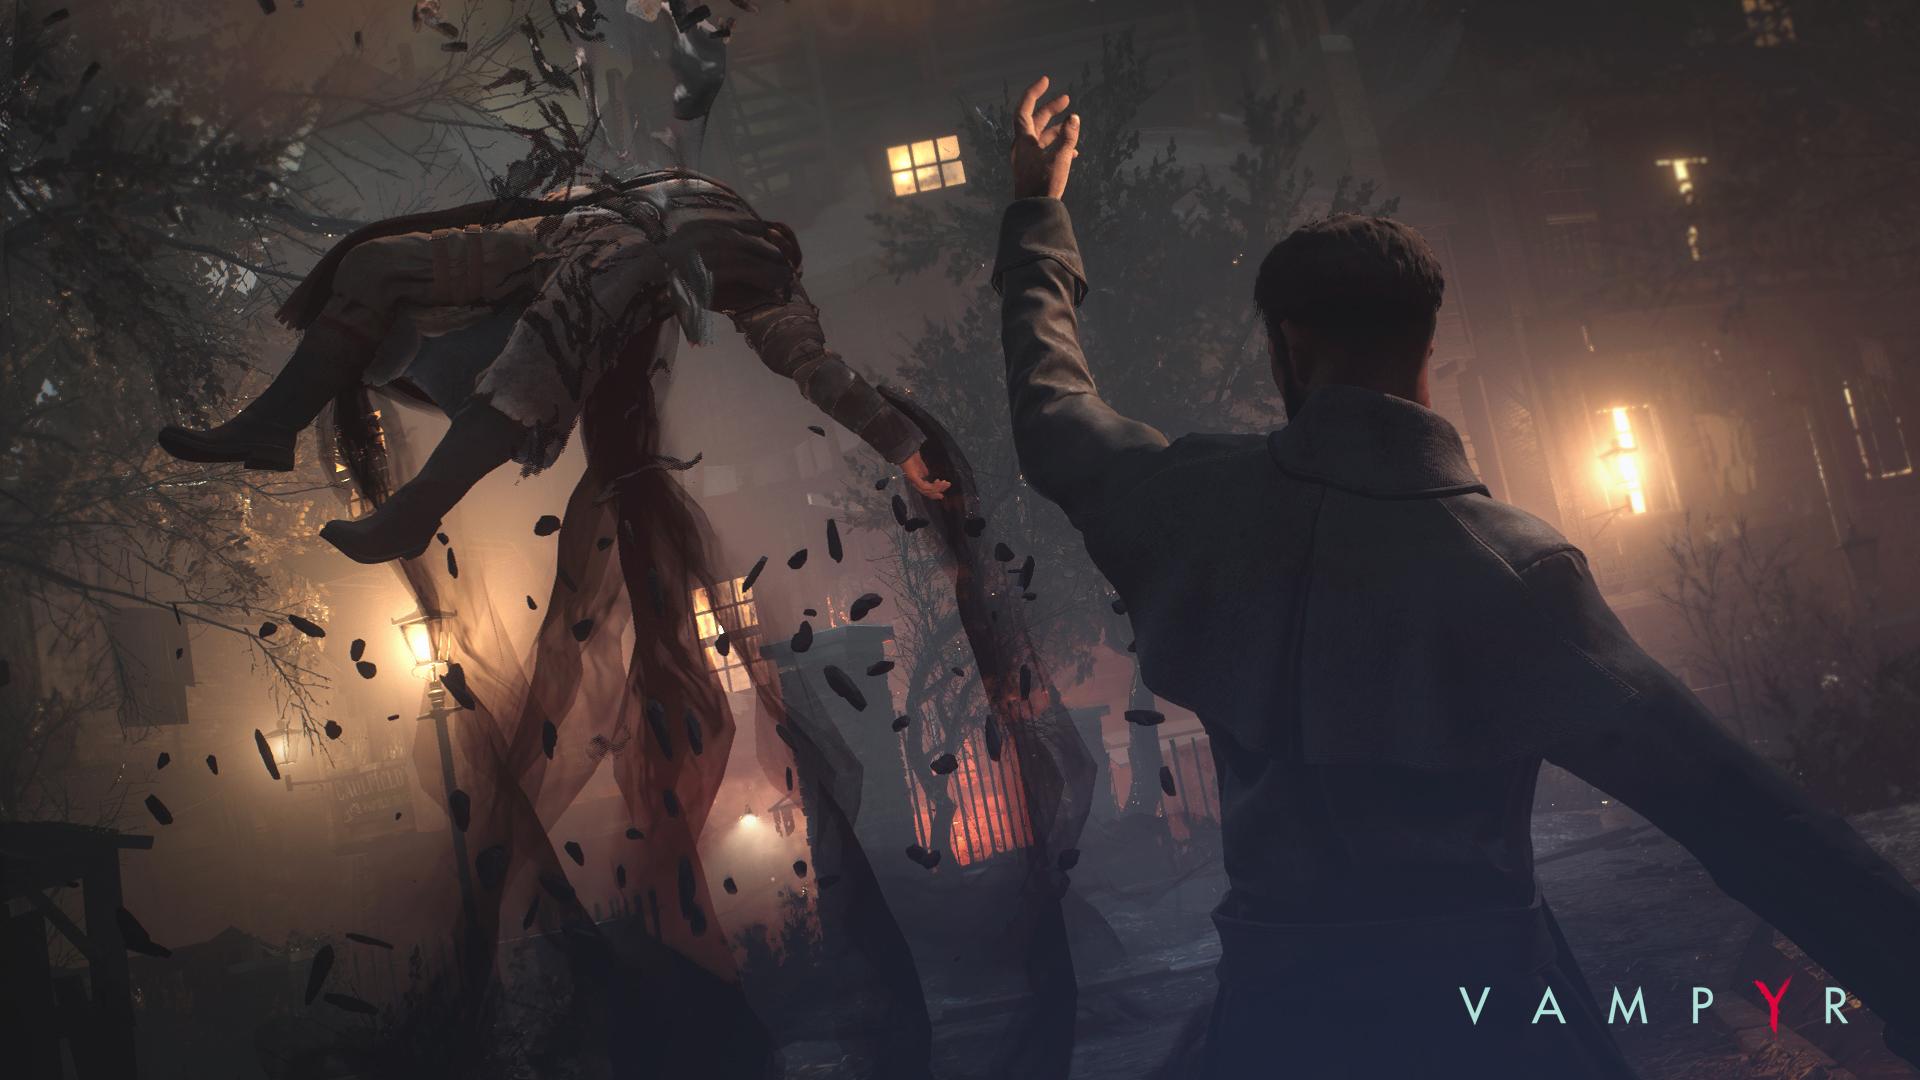 vampyr recensione